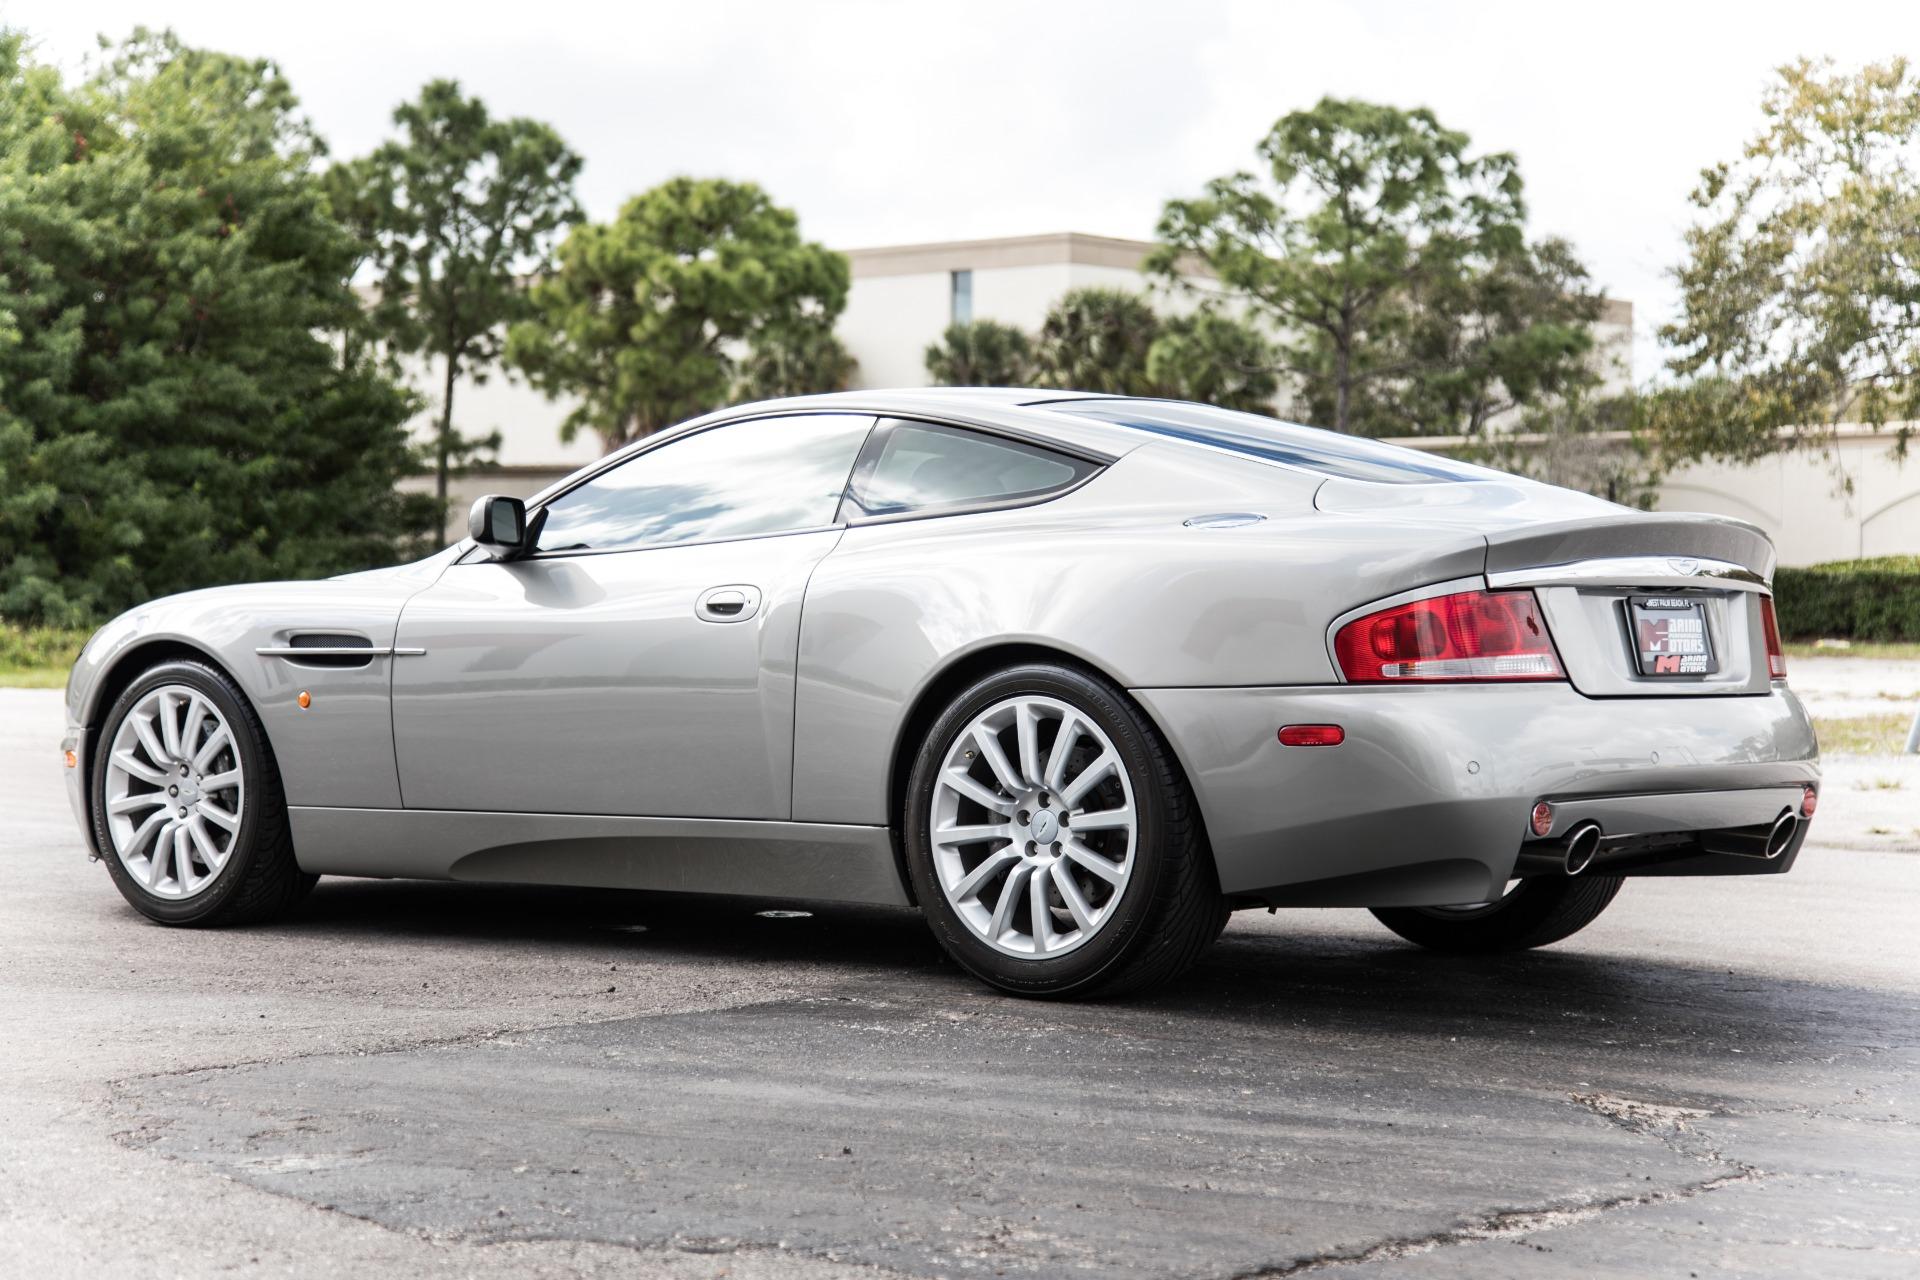 Used-2003-Aston-Martin-V12-Vanquish